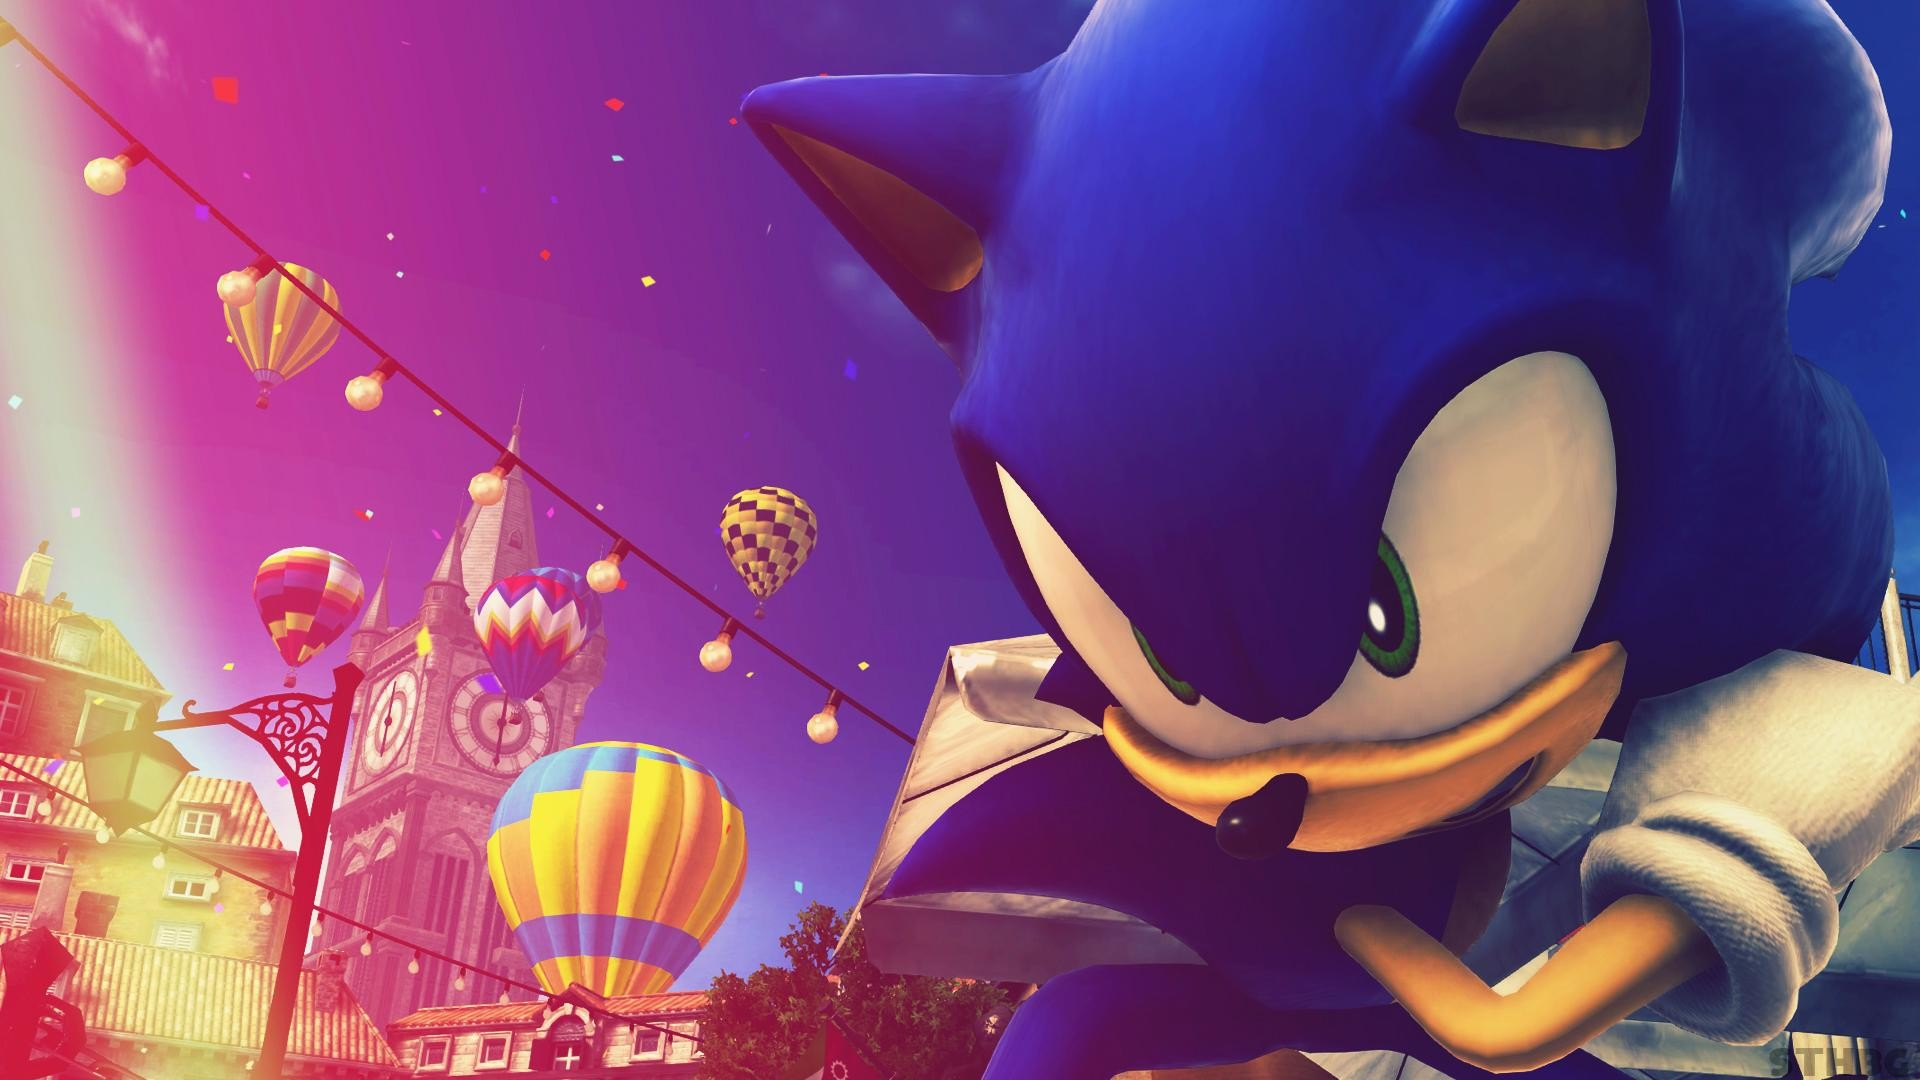 Sonic-The-Hedgehog-Desktop-Wallpaper-by-SonicTheHedgehogBG